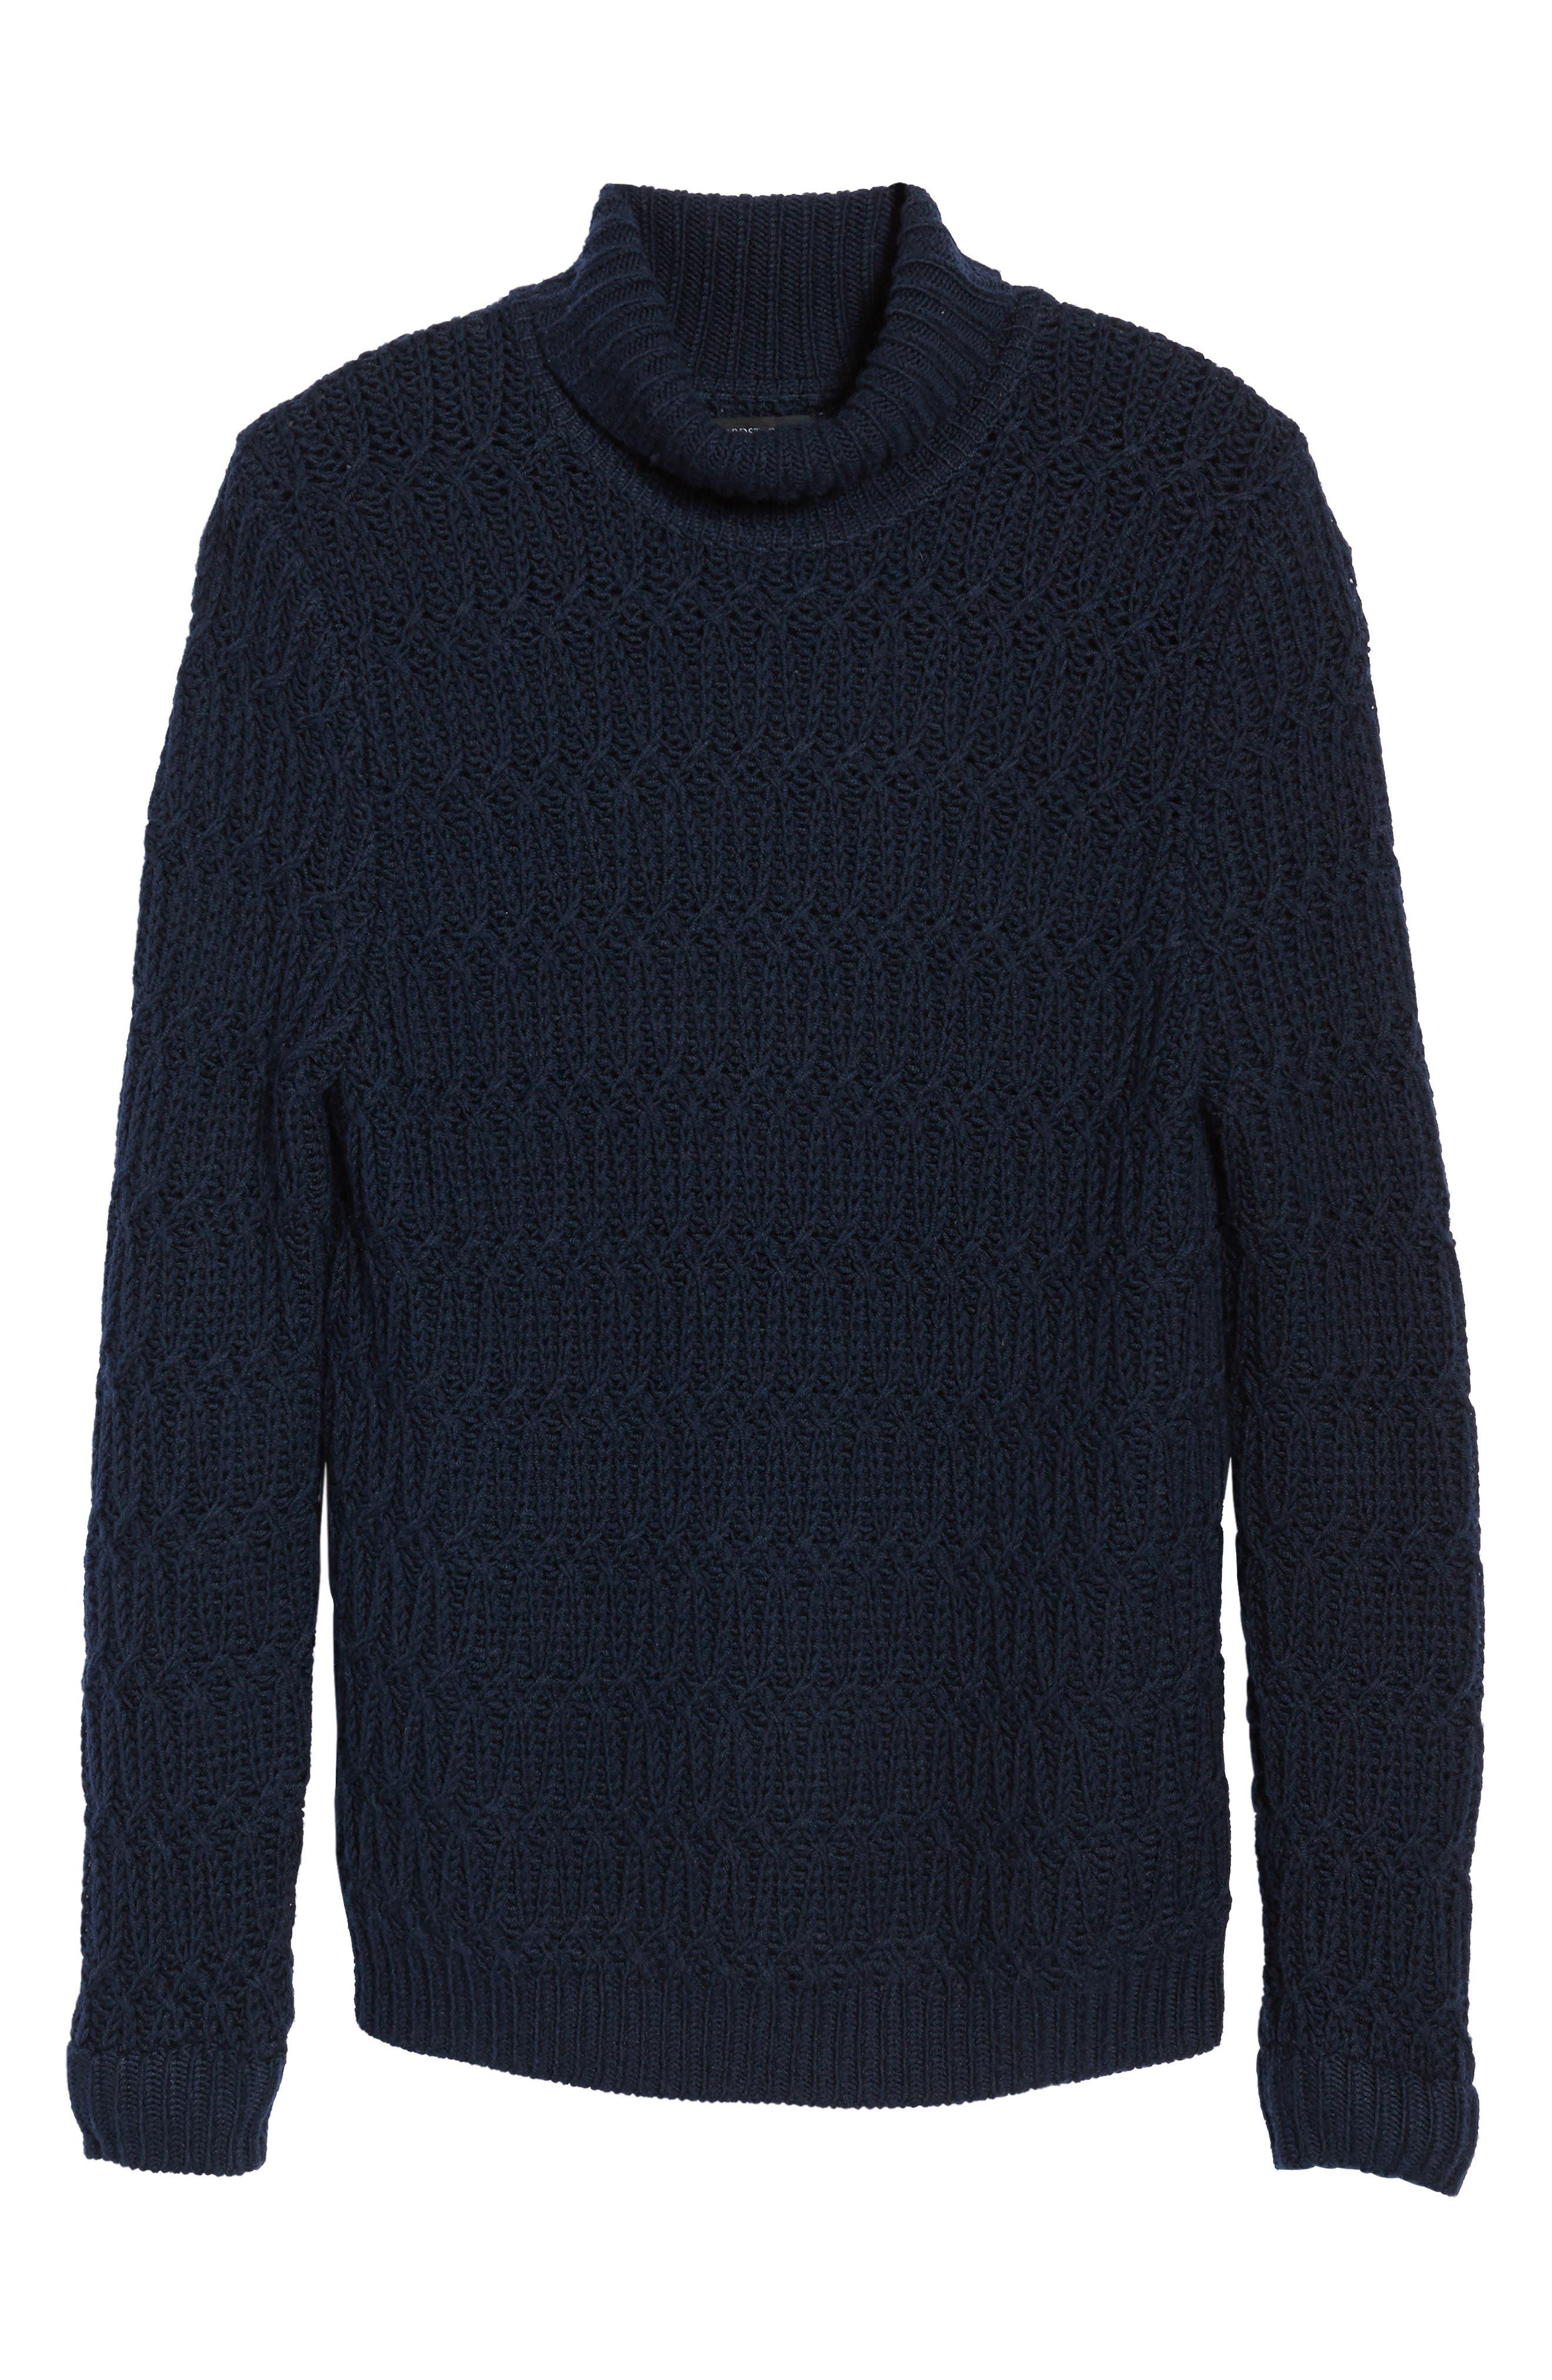 Chunky Turtleneck Sweater,                             Alternate thumbnail 6, color,